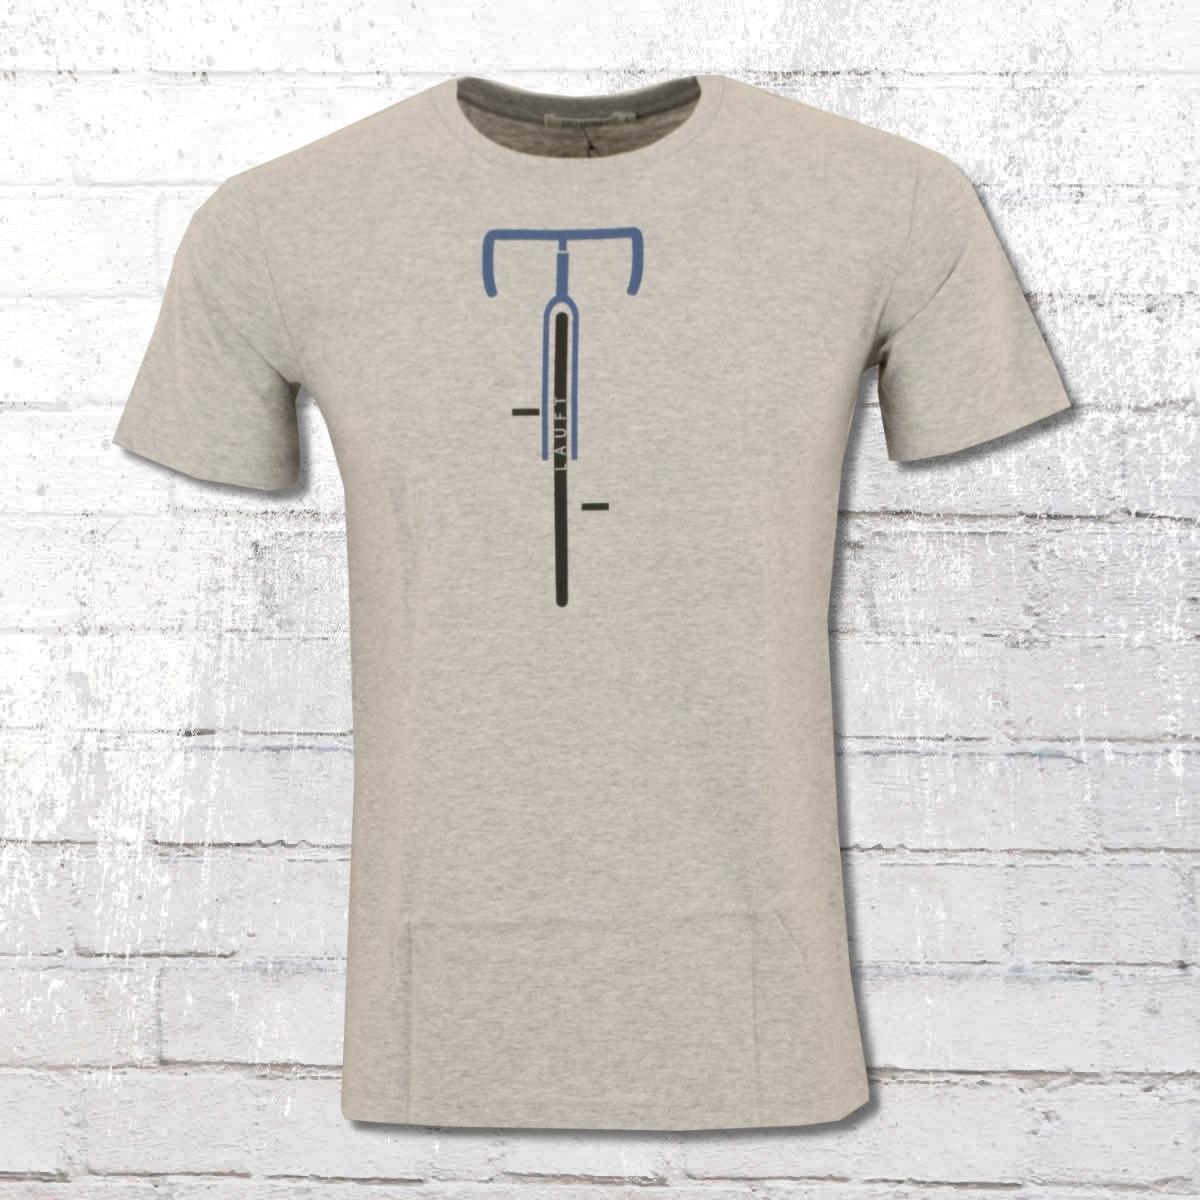 Greenbomb Herren Fahrrad T-Shirt Bike Läuft grau